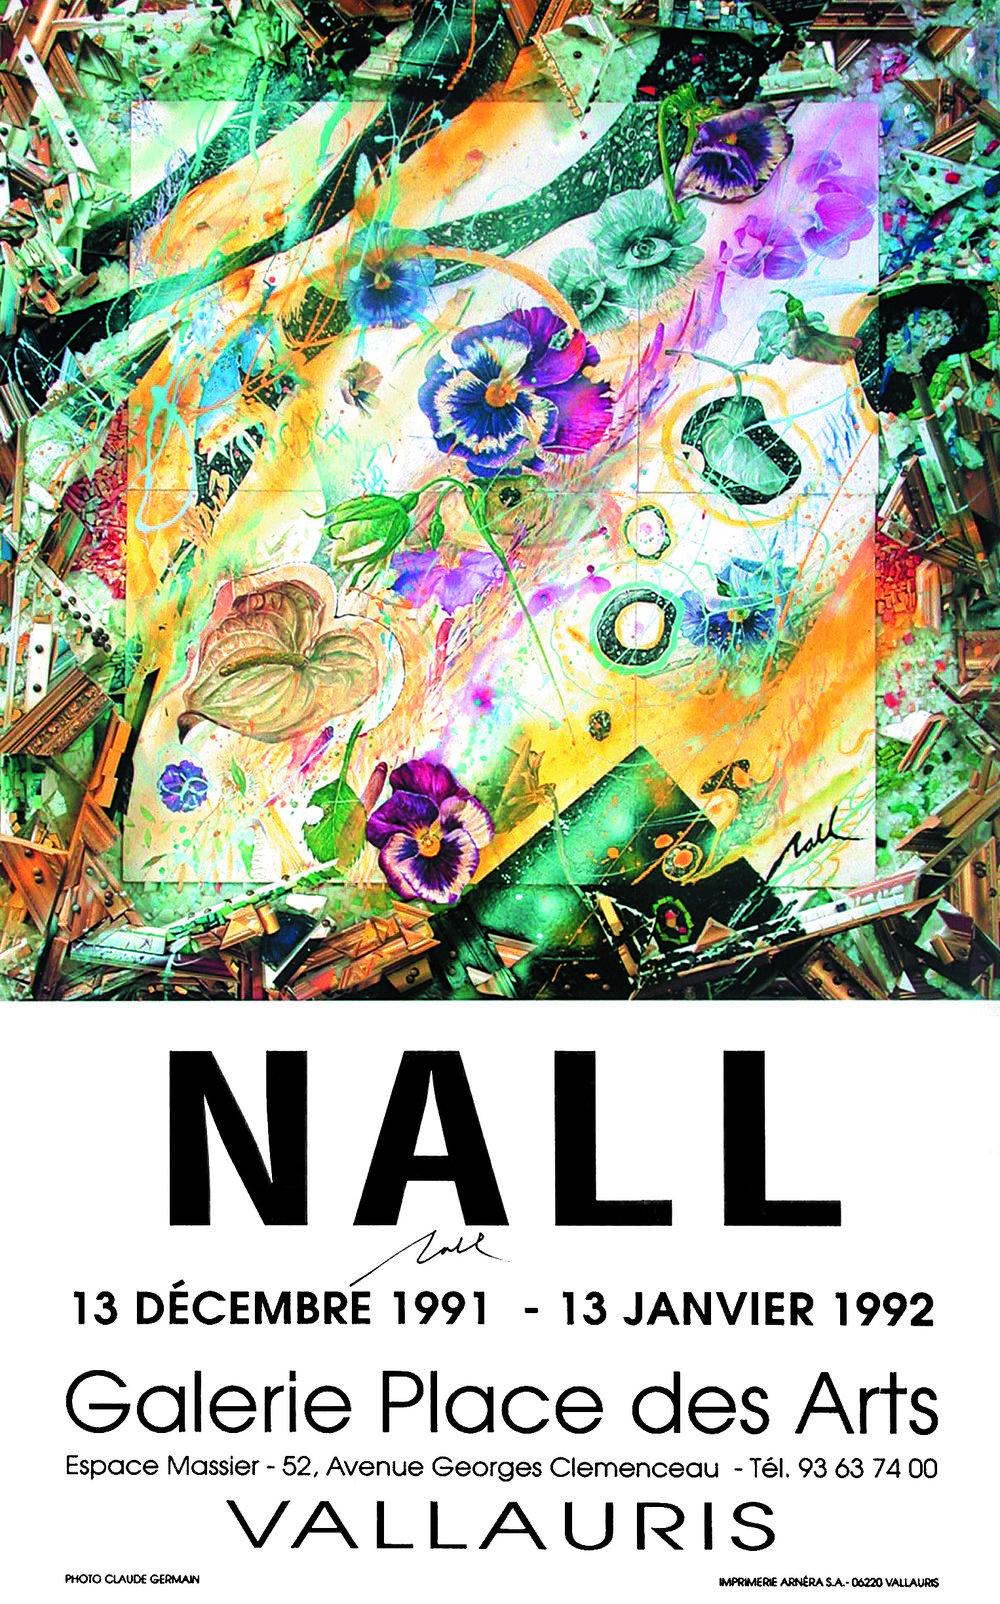 Nall Vallauris - 1992